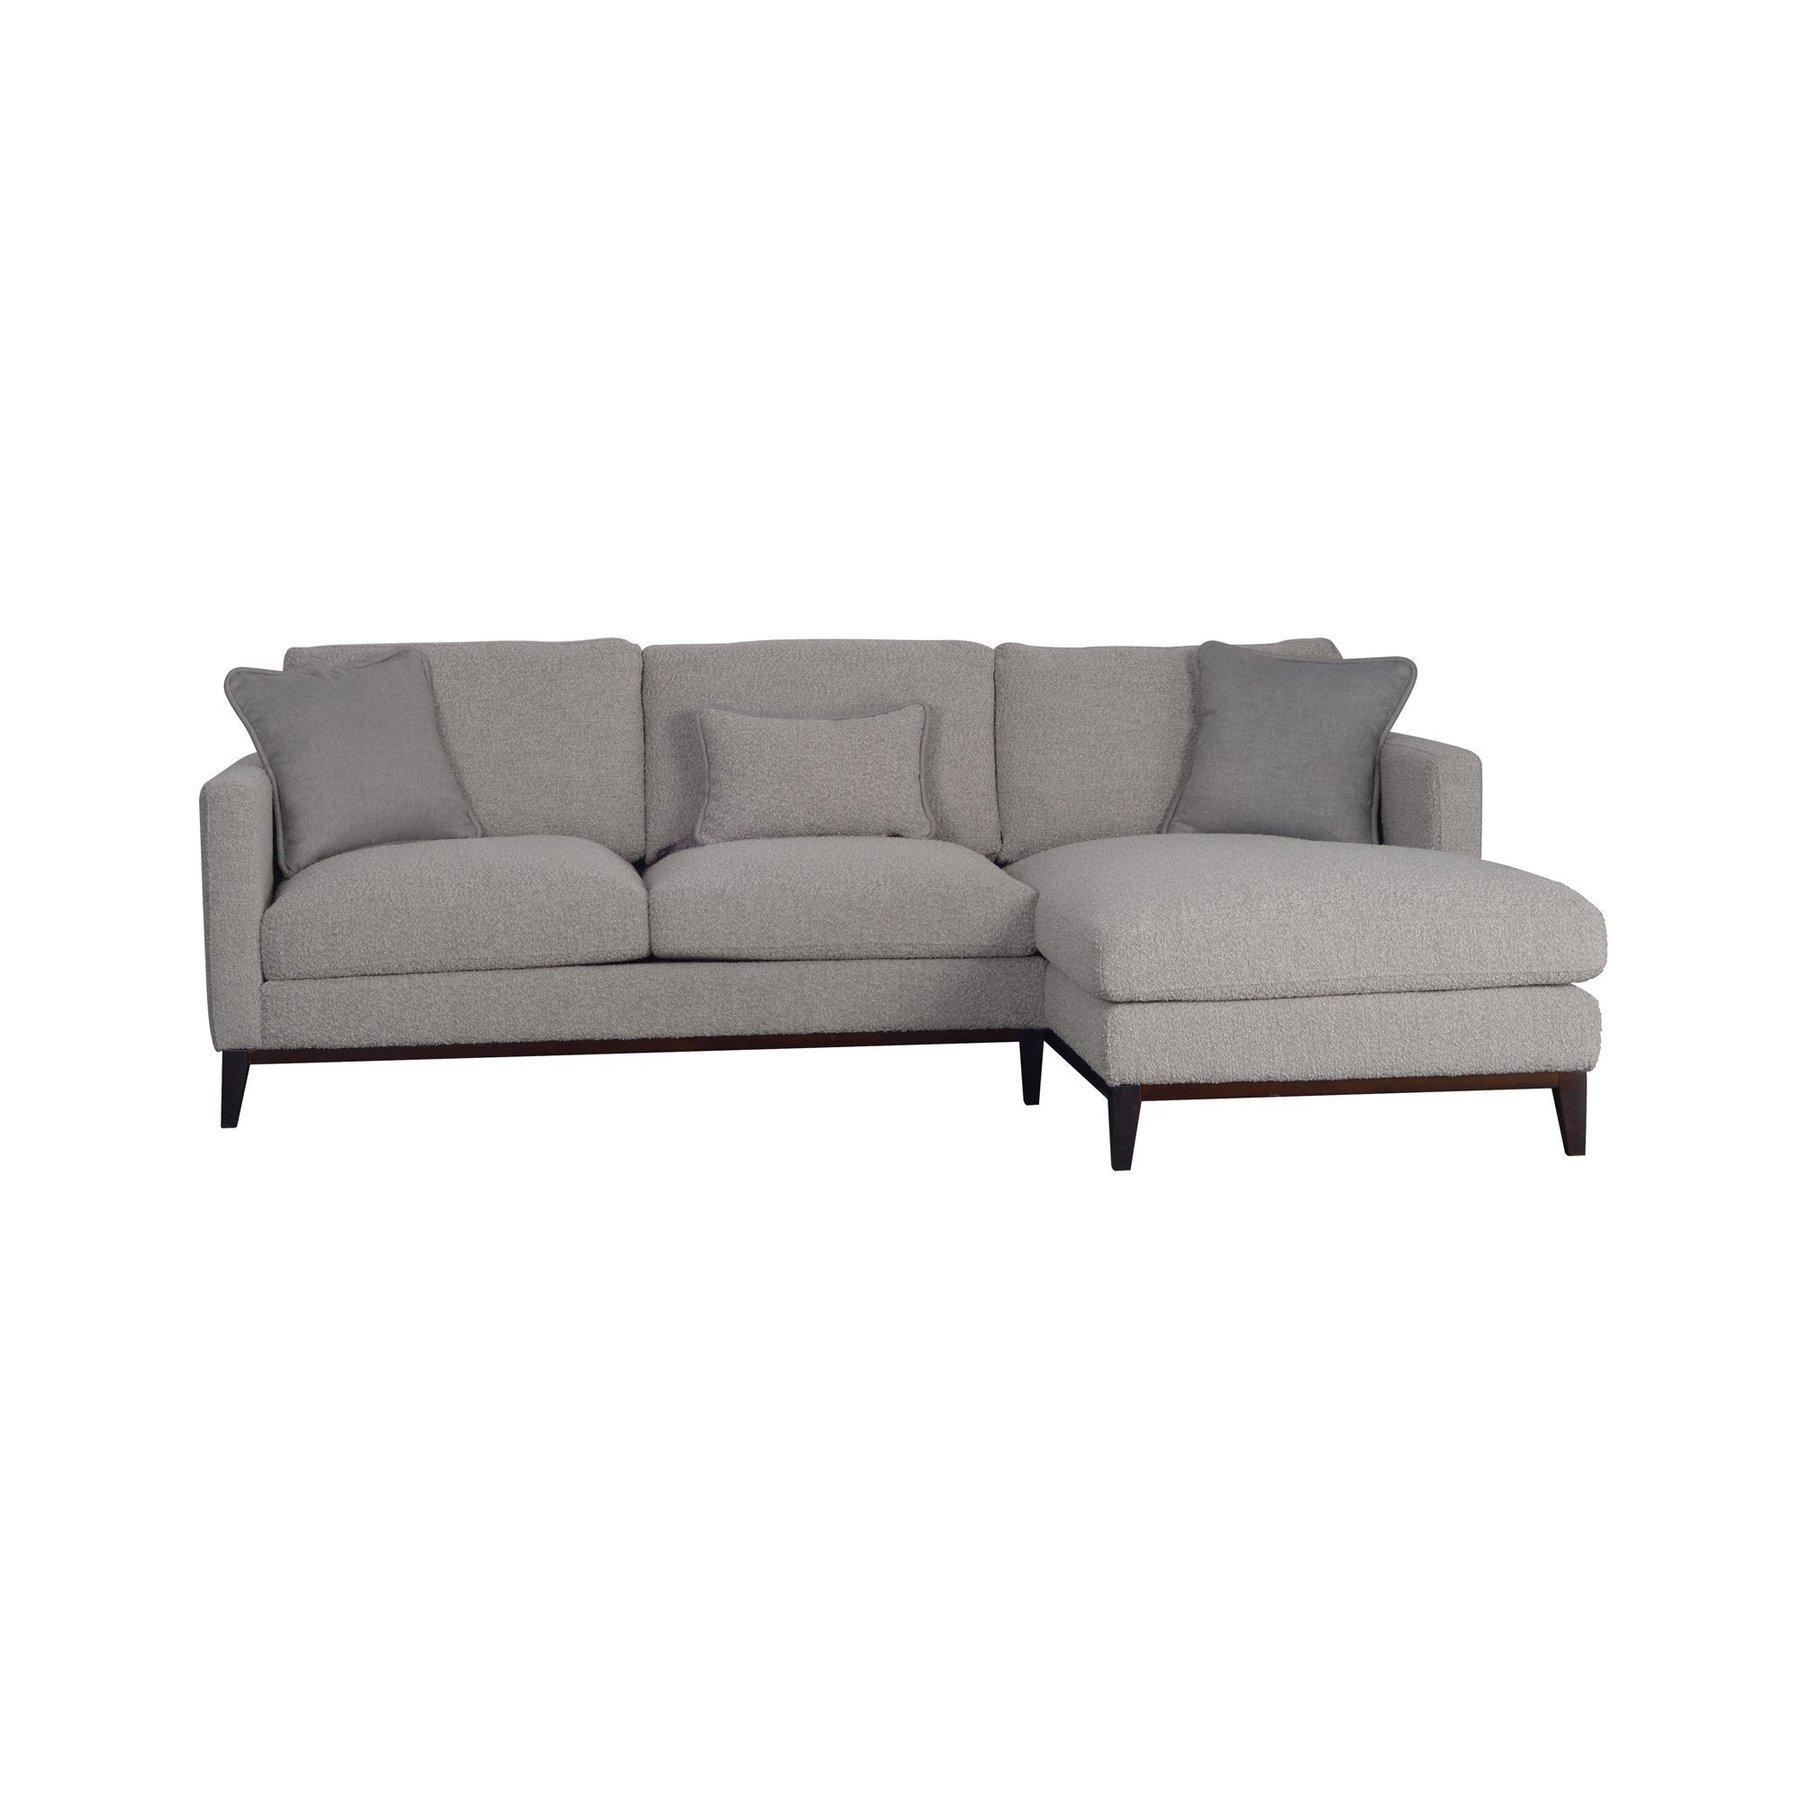 boucle sofa chaise